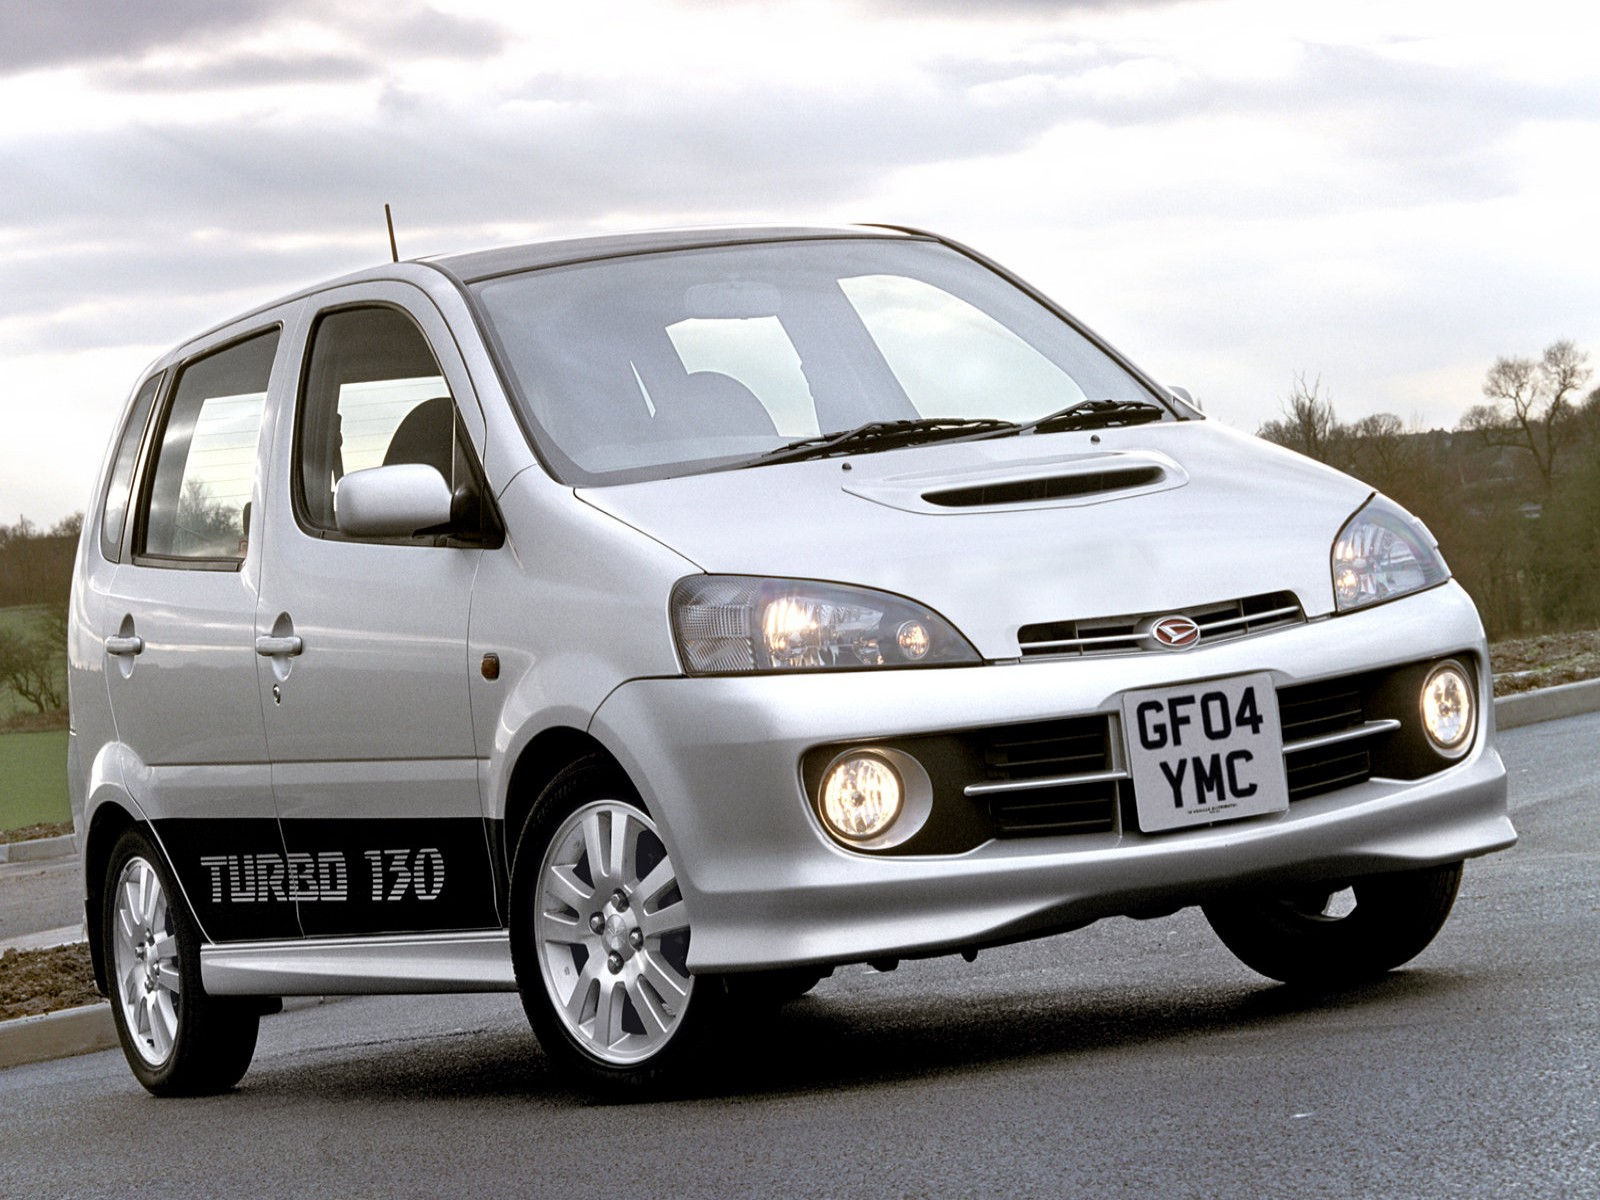 Daihatsu yrv 1.3 turbo